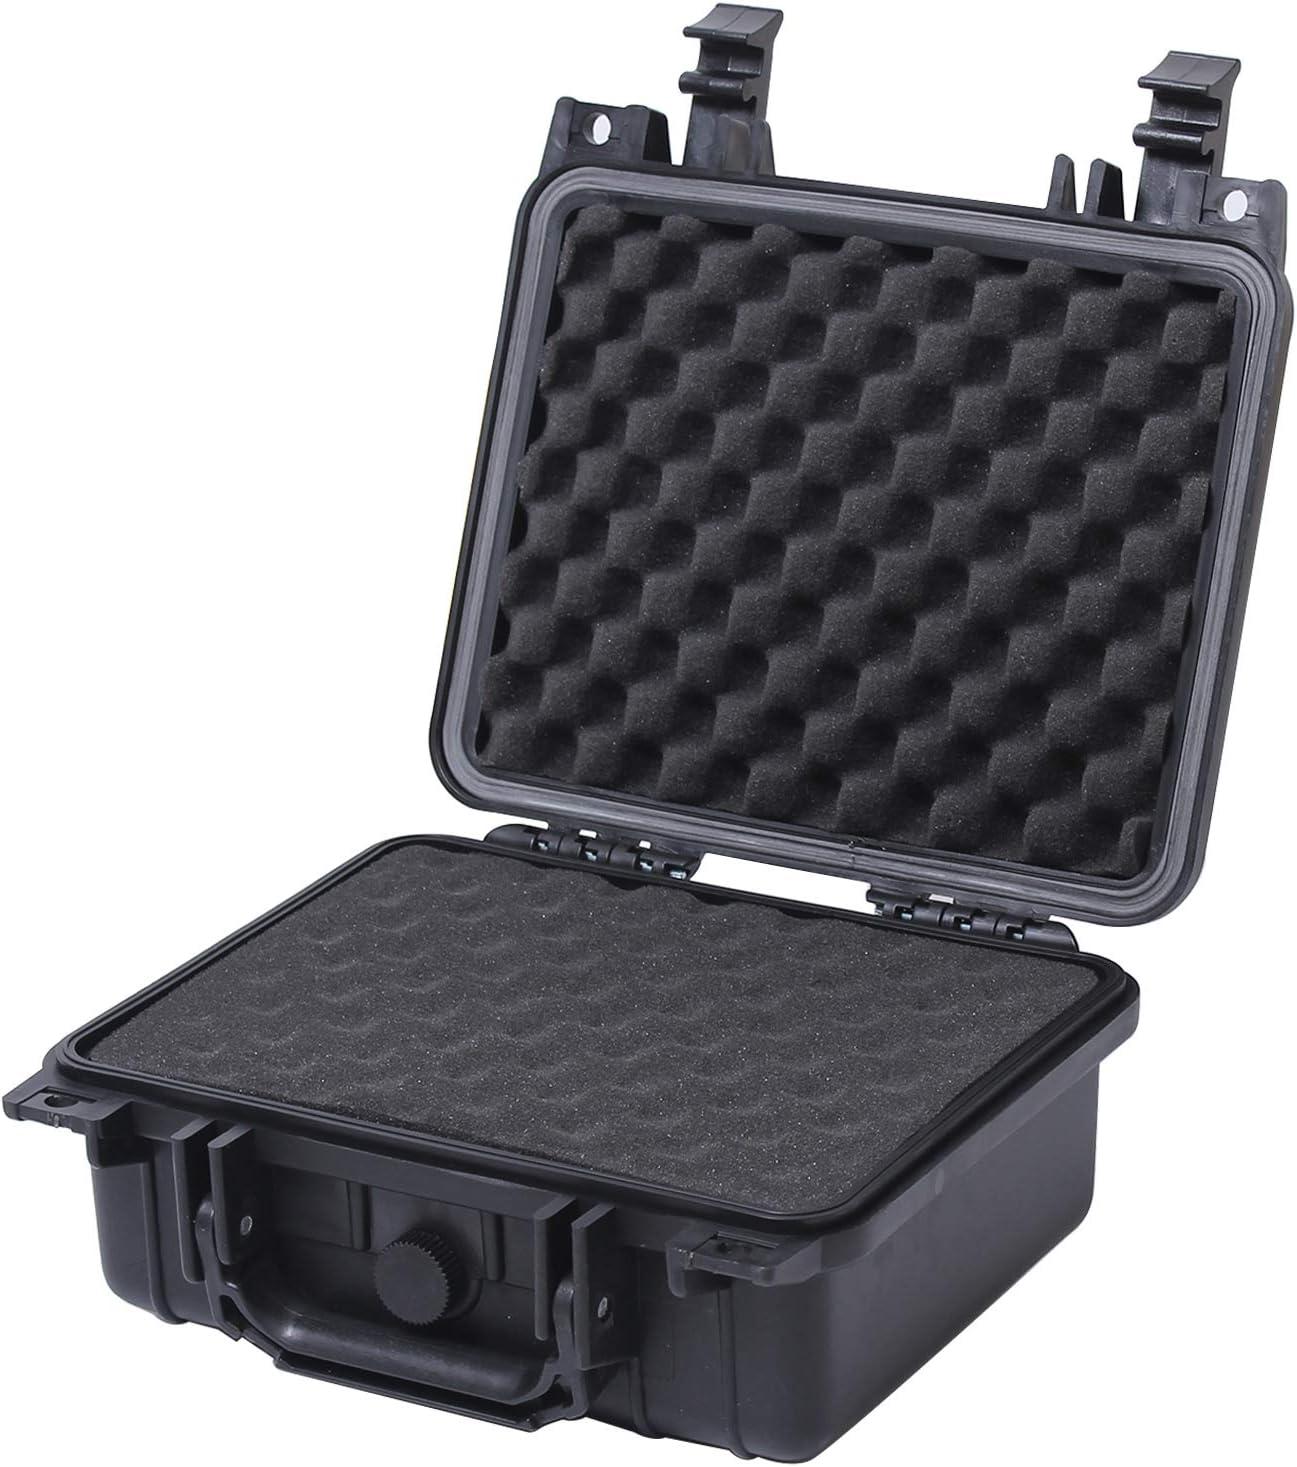 TANKSTORM Waterproof Hard Protective Case cheap Super-cheap Foam Customizable with